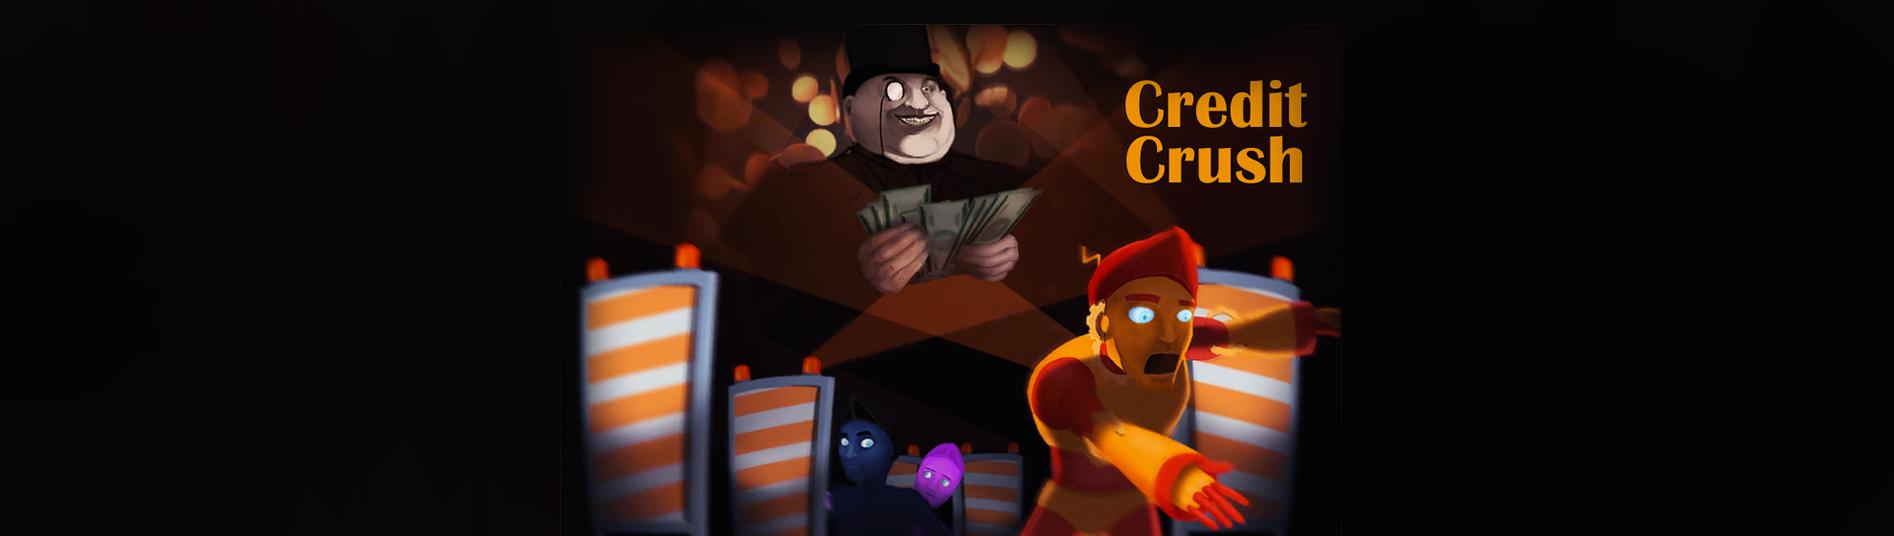 Credit Crush